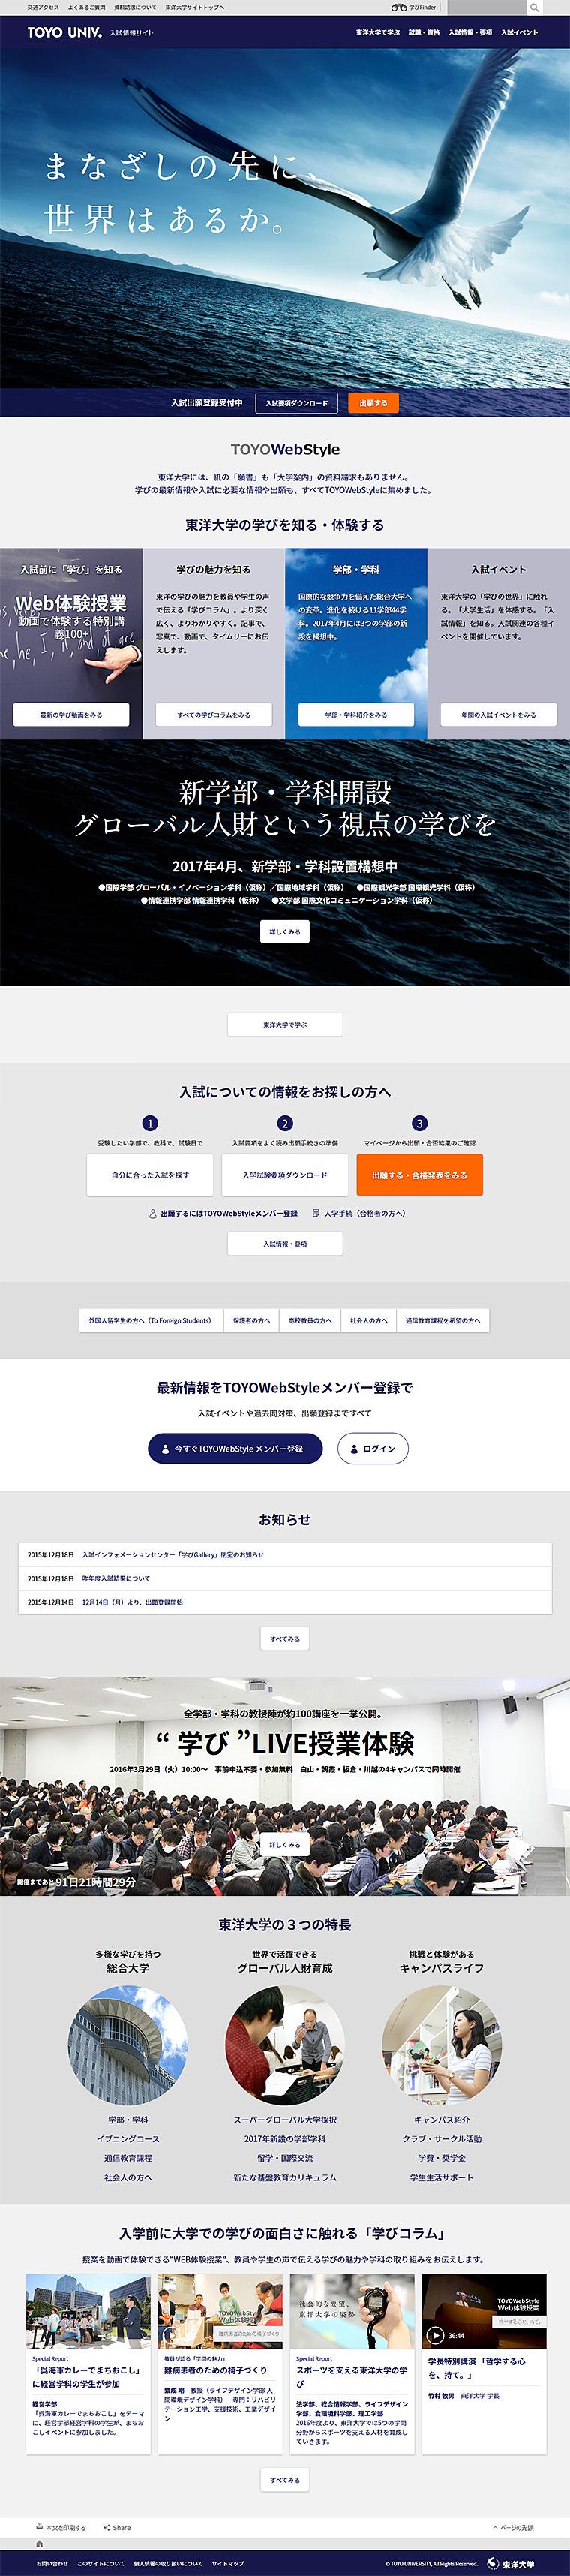 東洋大学 入試情報サイト